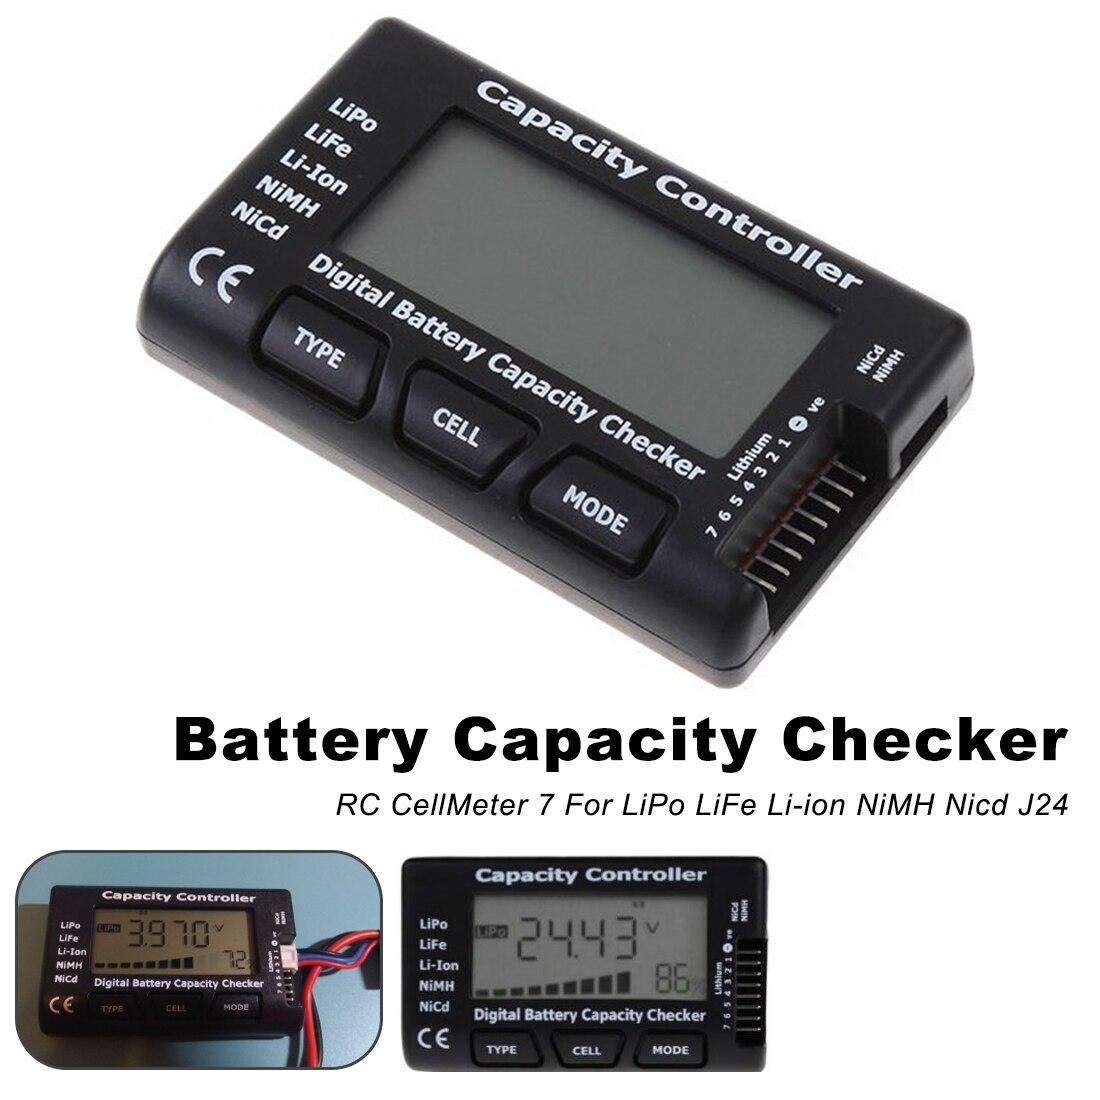 Measurement Tool Battery Voltage Tester Checking RC Meter 7 Digital Cell Battery Capacity Checker For LiPo LiFe Li-ion Nicd NiMHMeasurement Tool Battery Voltage Tester Checking RC Meter 7 Digital Cell Battery Capacity Checker For LiPo LiFe Li-ion Nicd NiMH